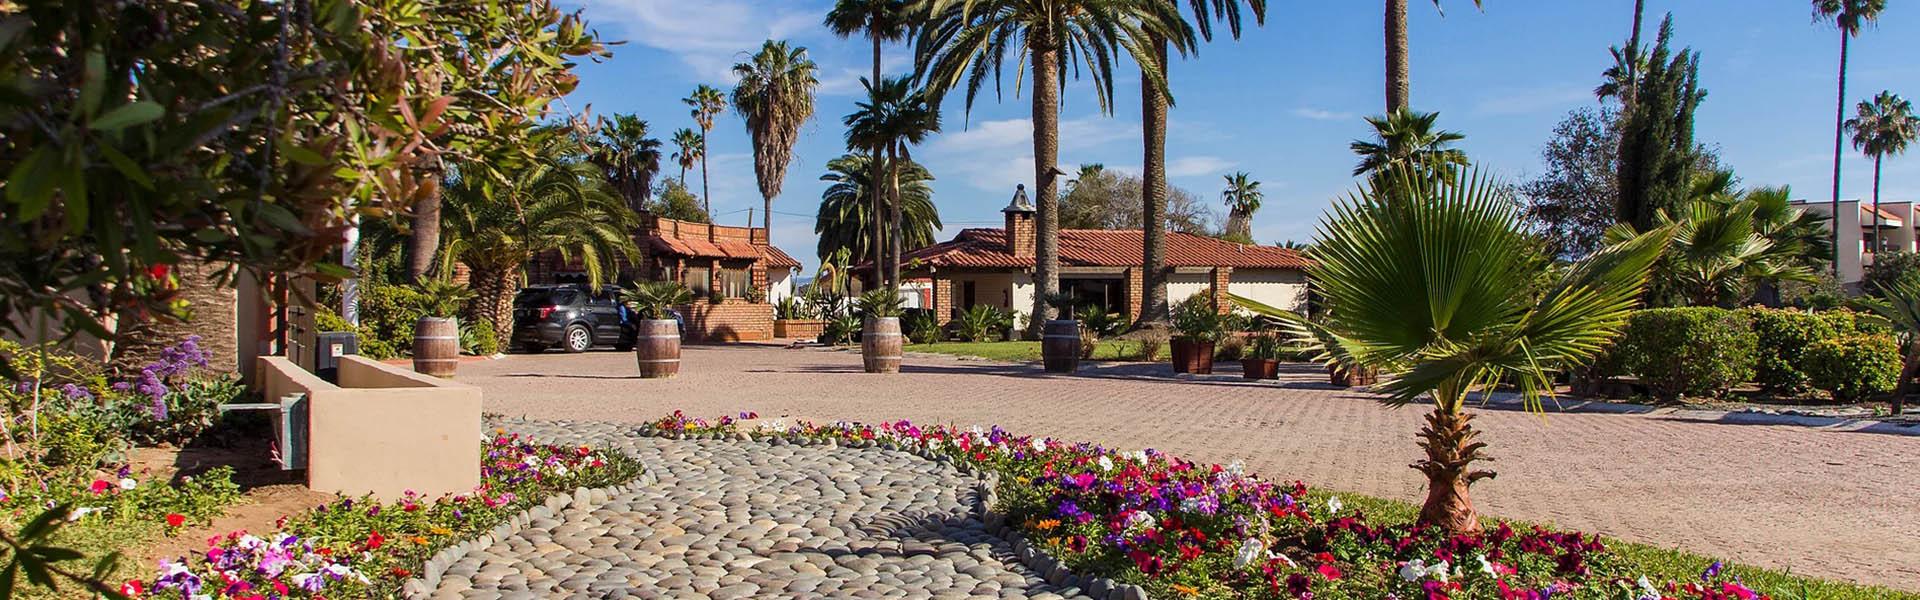 Quintas Papagay Ensenada Baja California